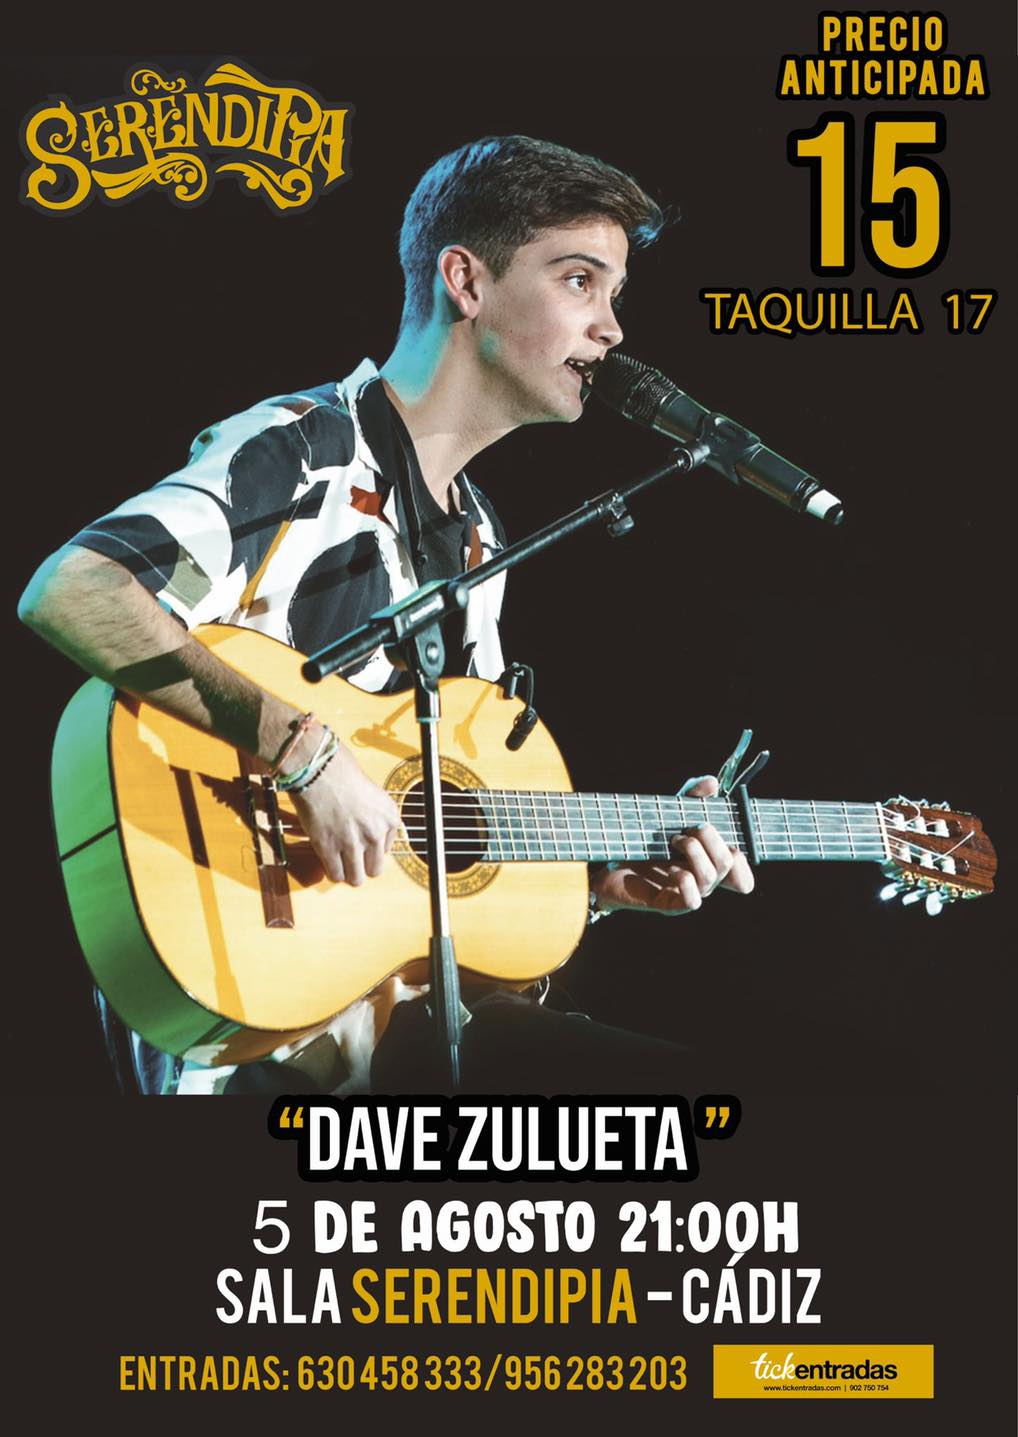 Concierto de Dave Zulueta en Serendipia